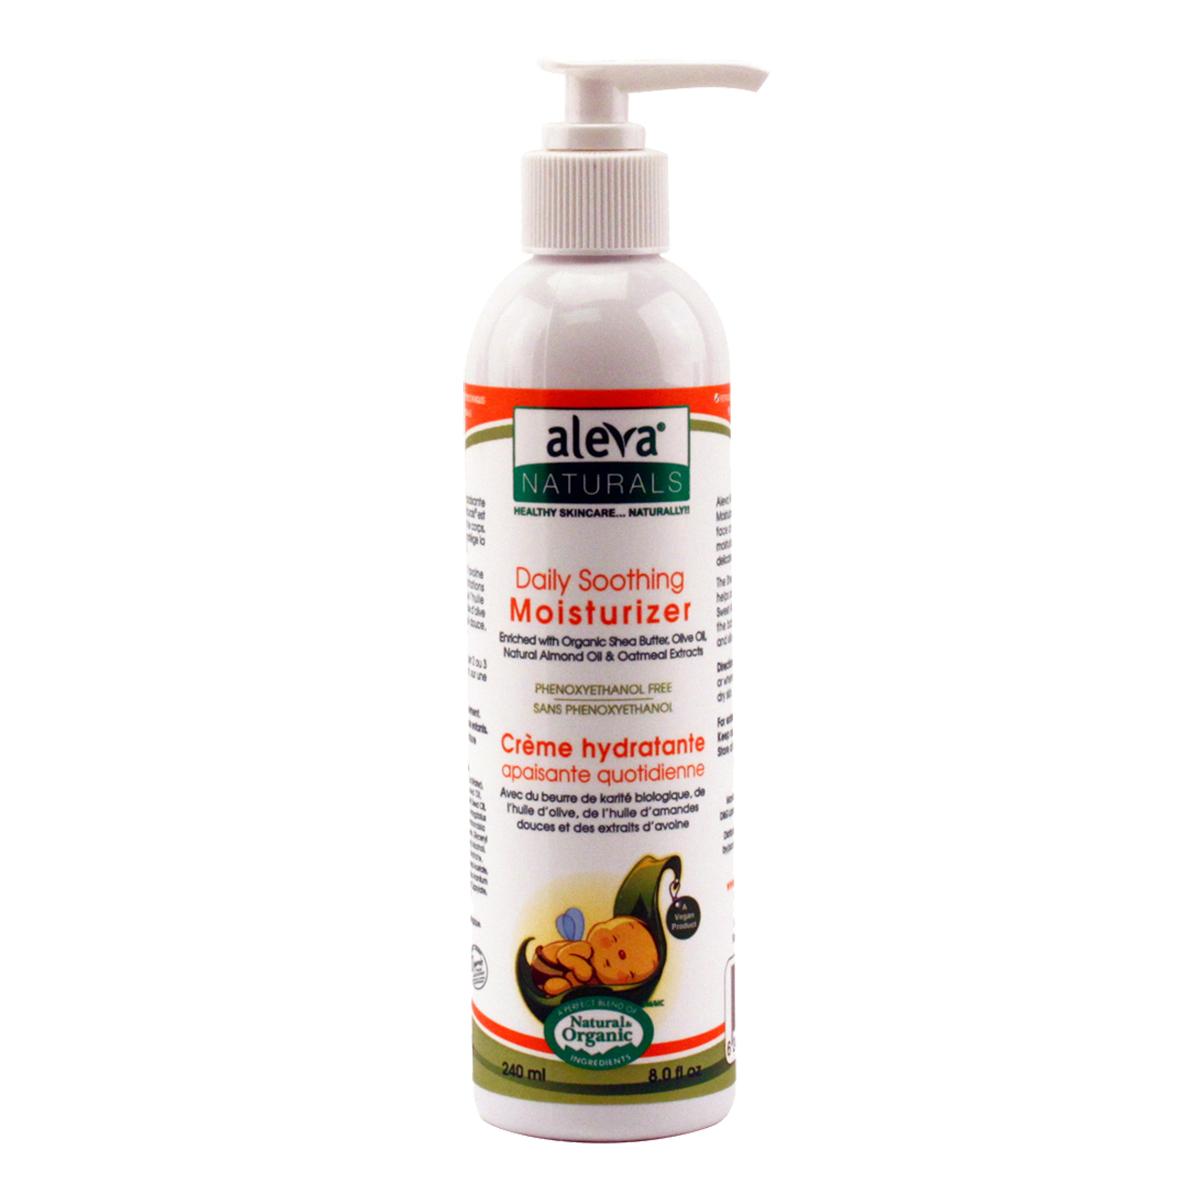 crema hidratanta pentru utilizare zilnica aleva naturals, 240 ml